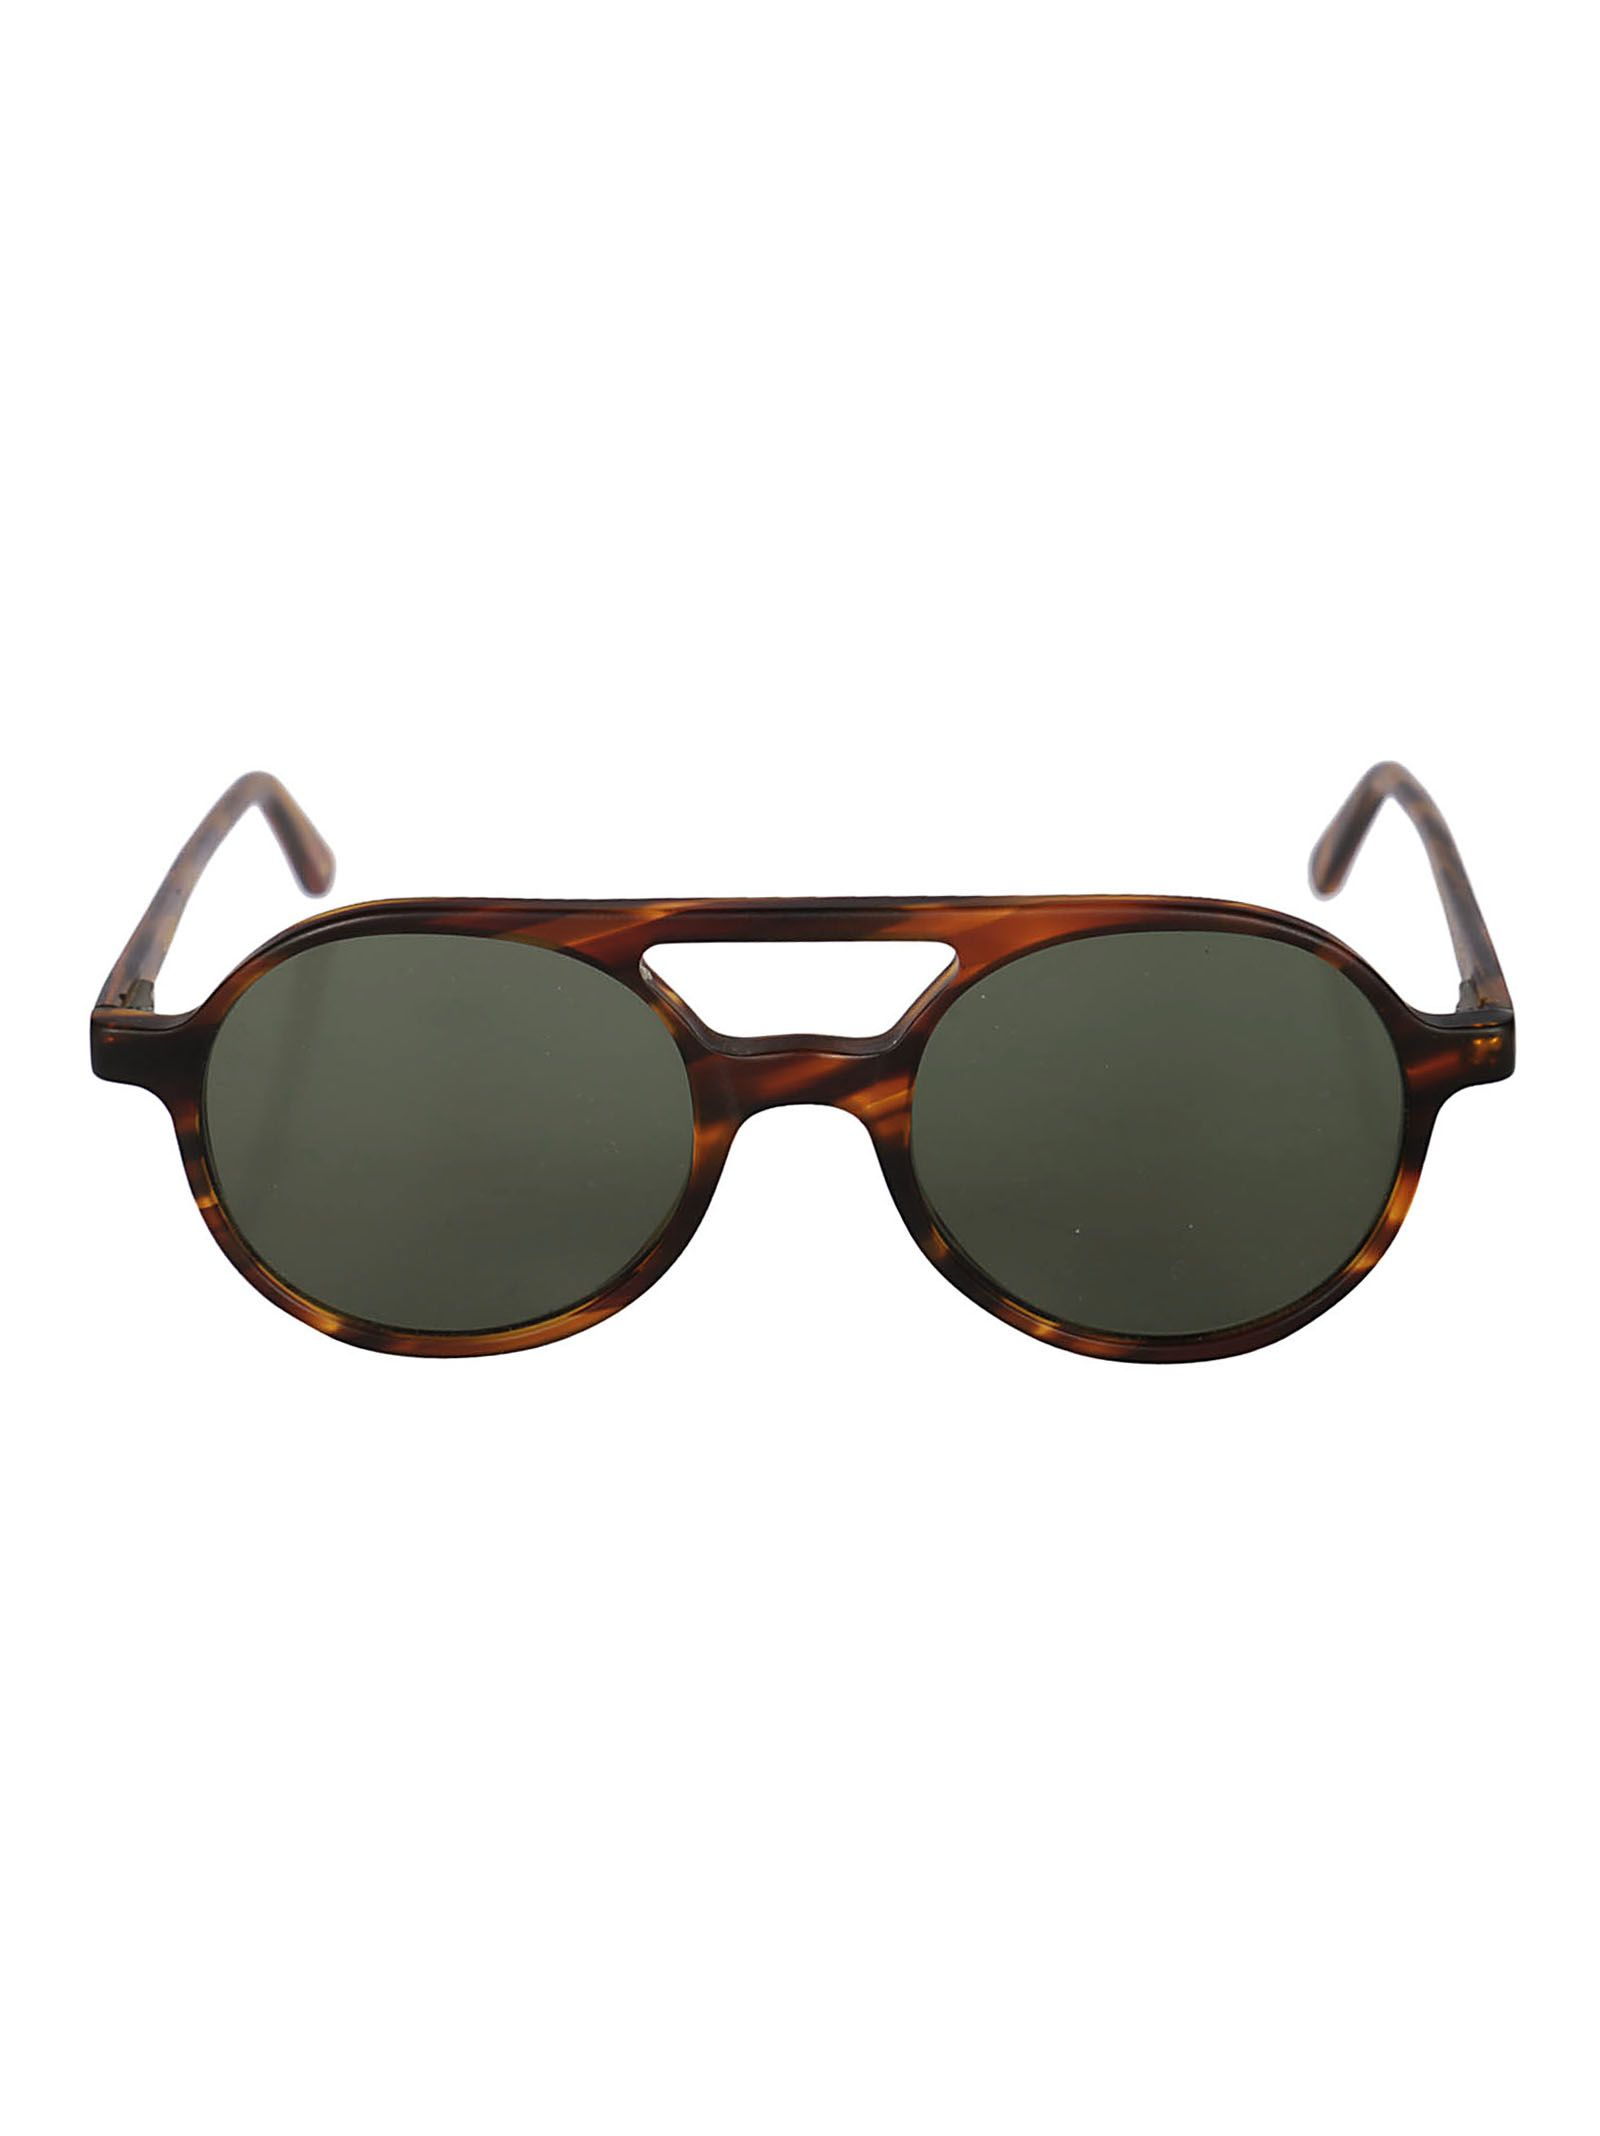 L.G.R Lgr Aviator Sunglasses in Havana